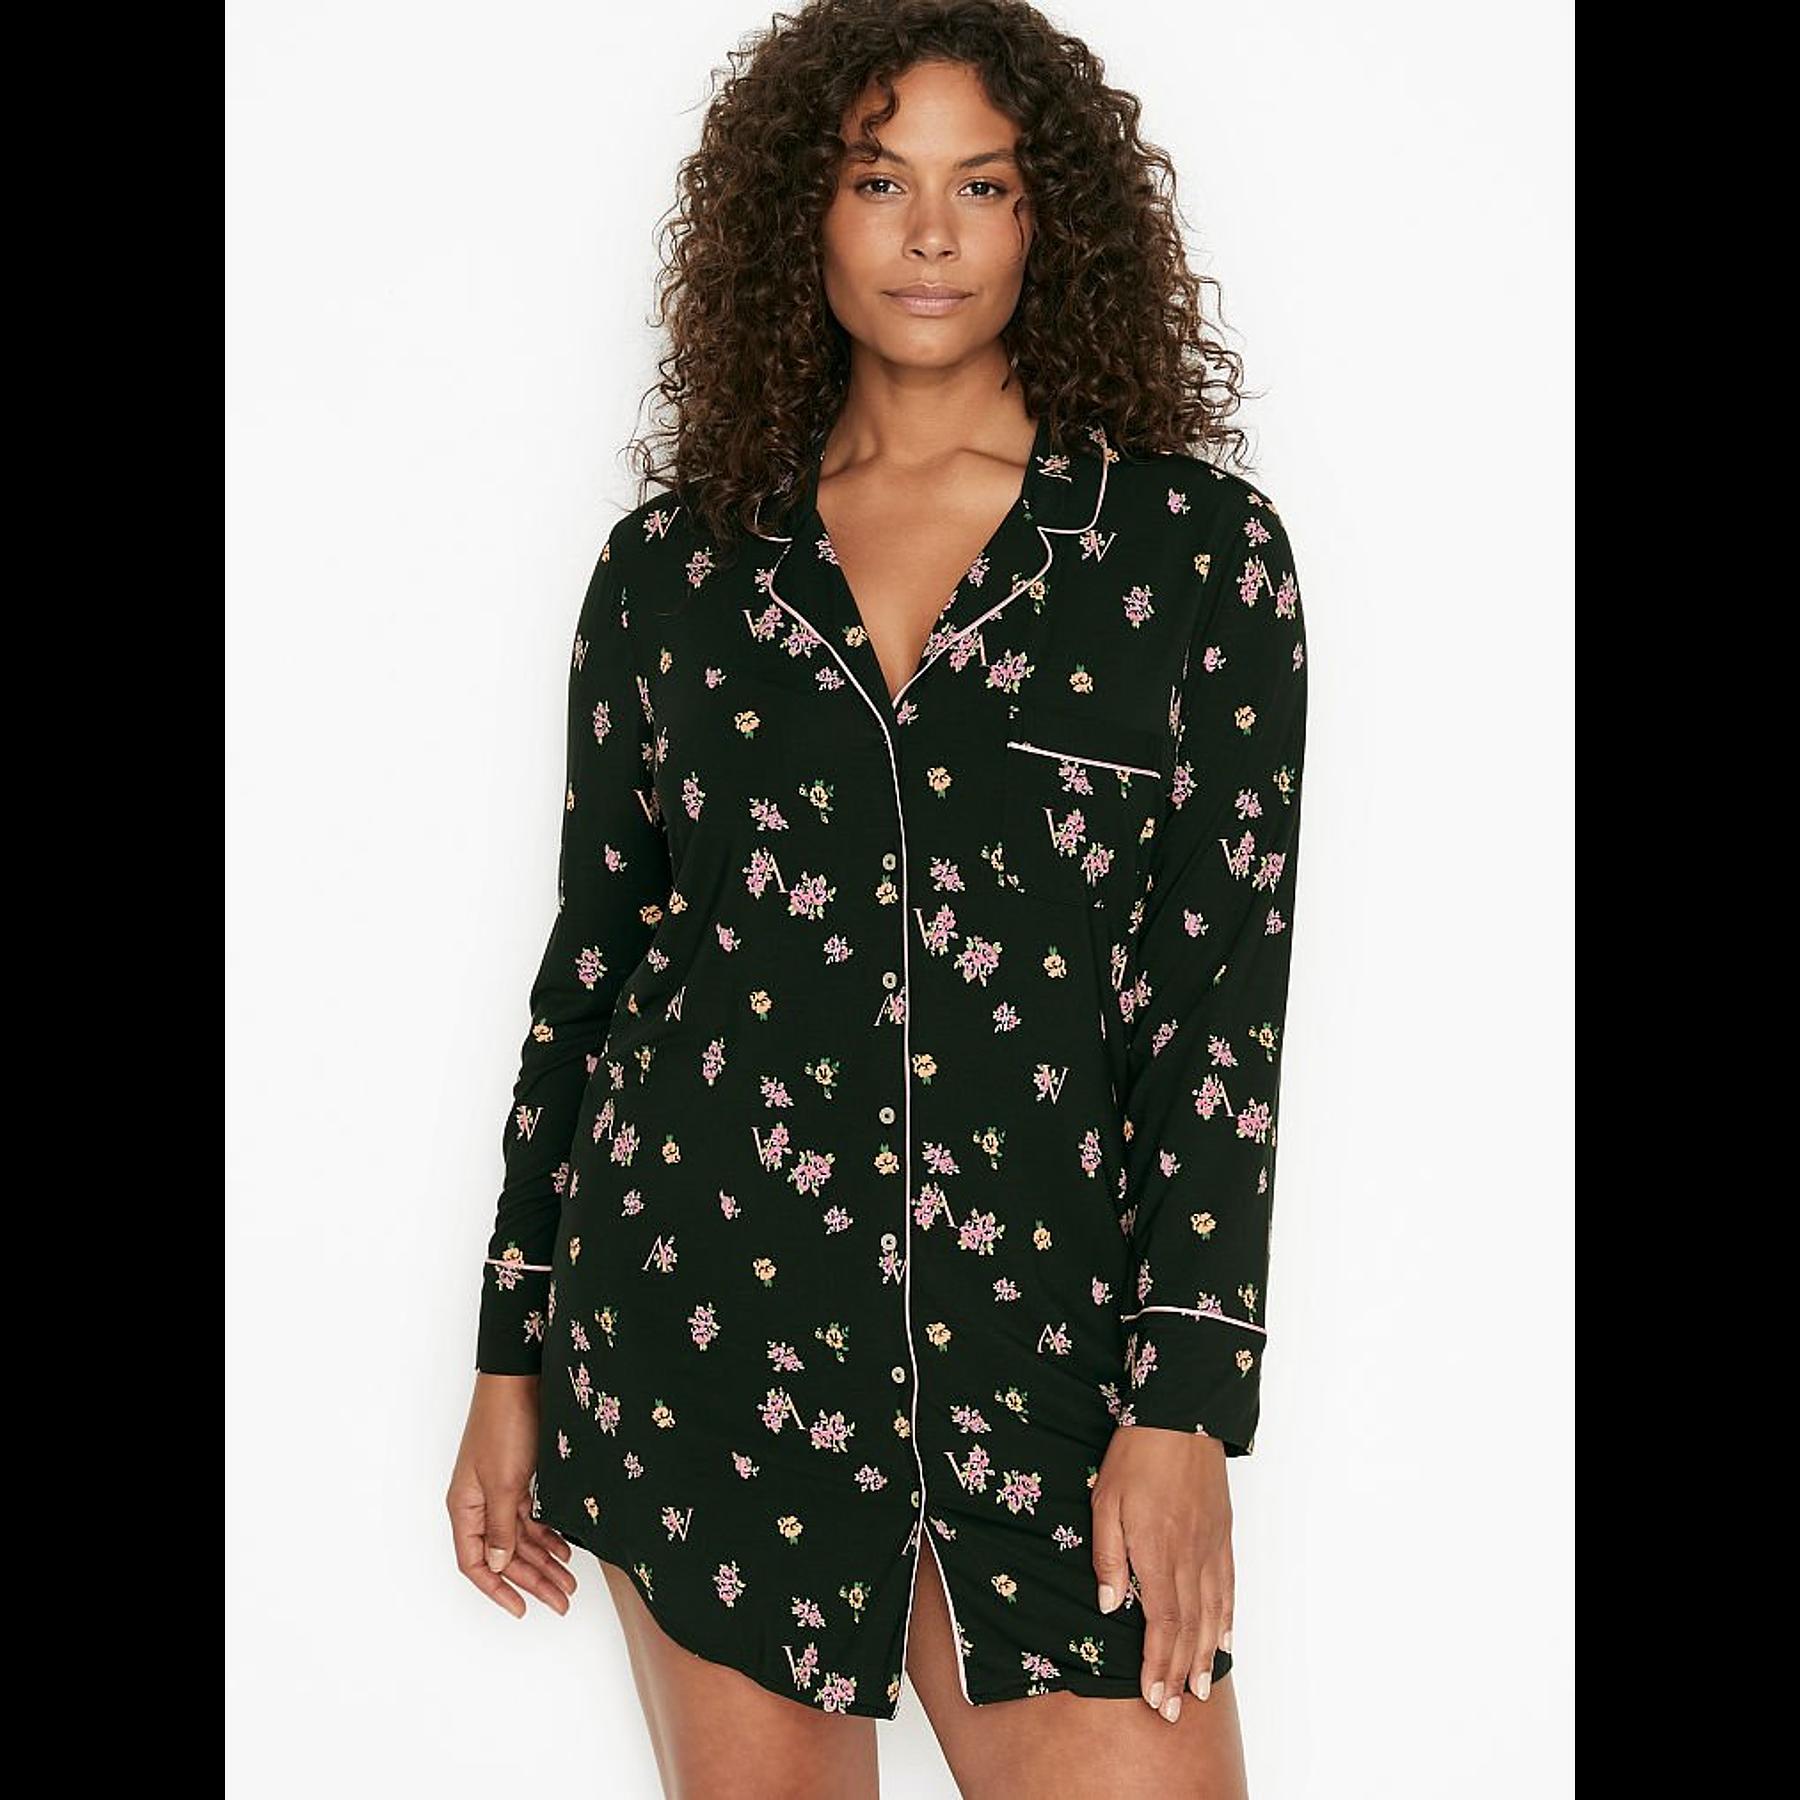 Camisa de dormir negra floreada Victoria Secret